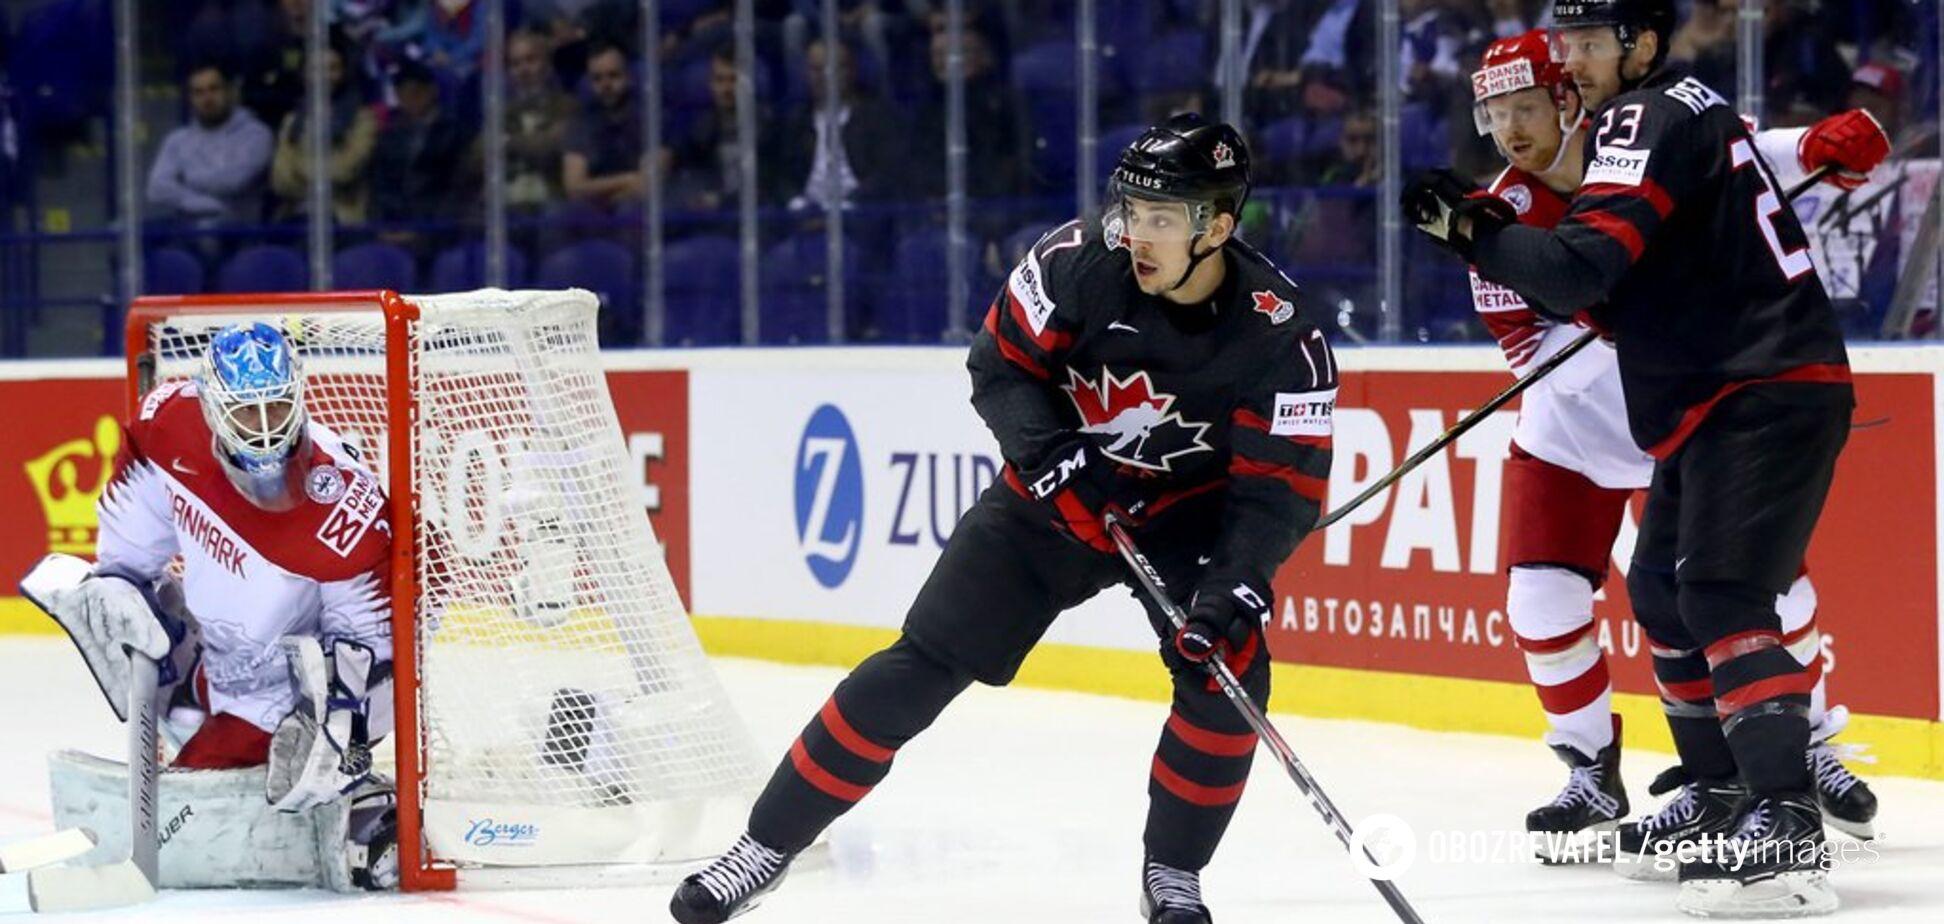 Канада - Чехія: рахунок 1/2 фіналу хокею на чемпіонаті світу